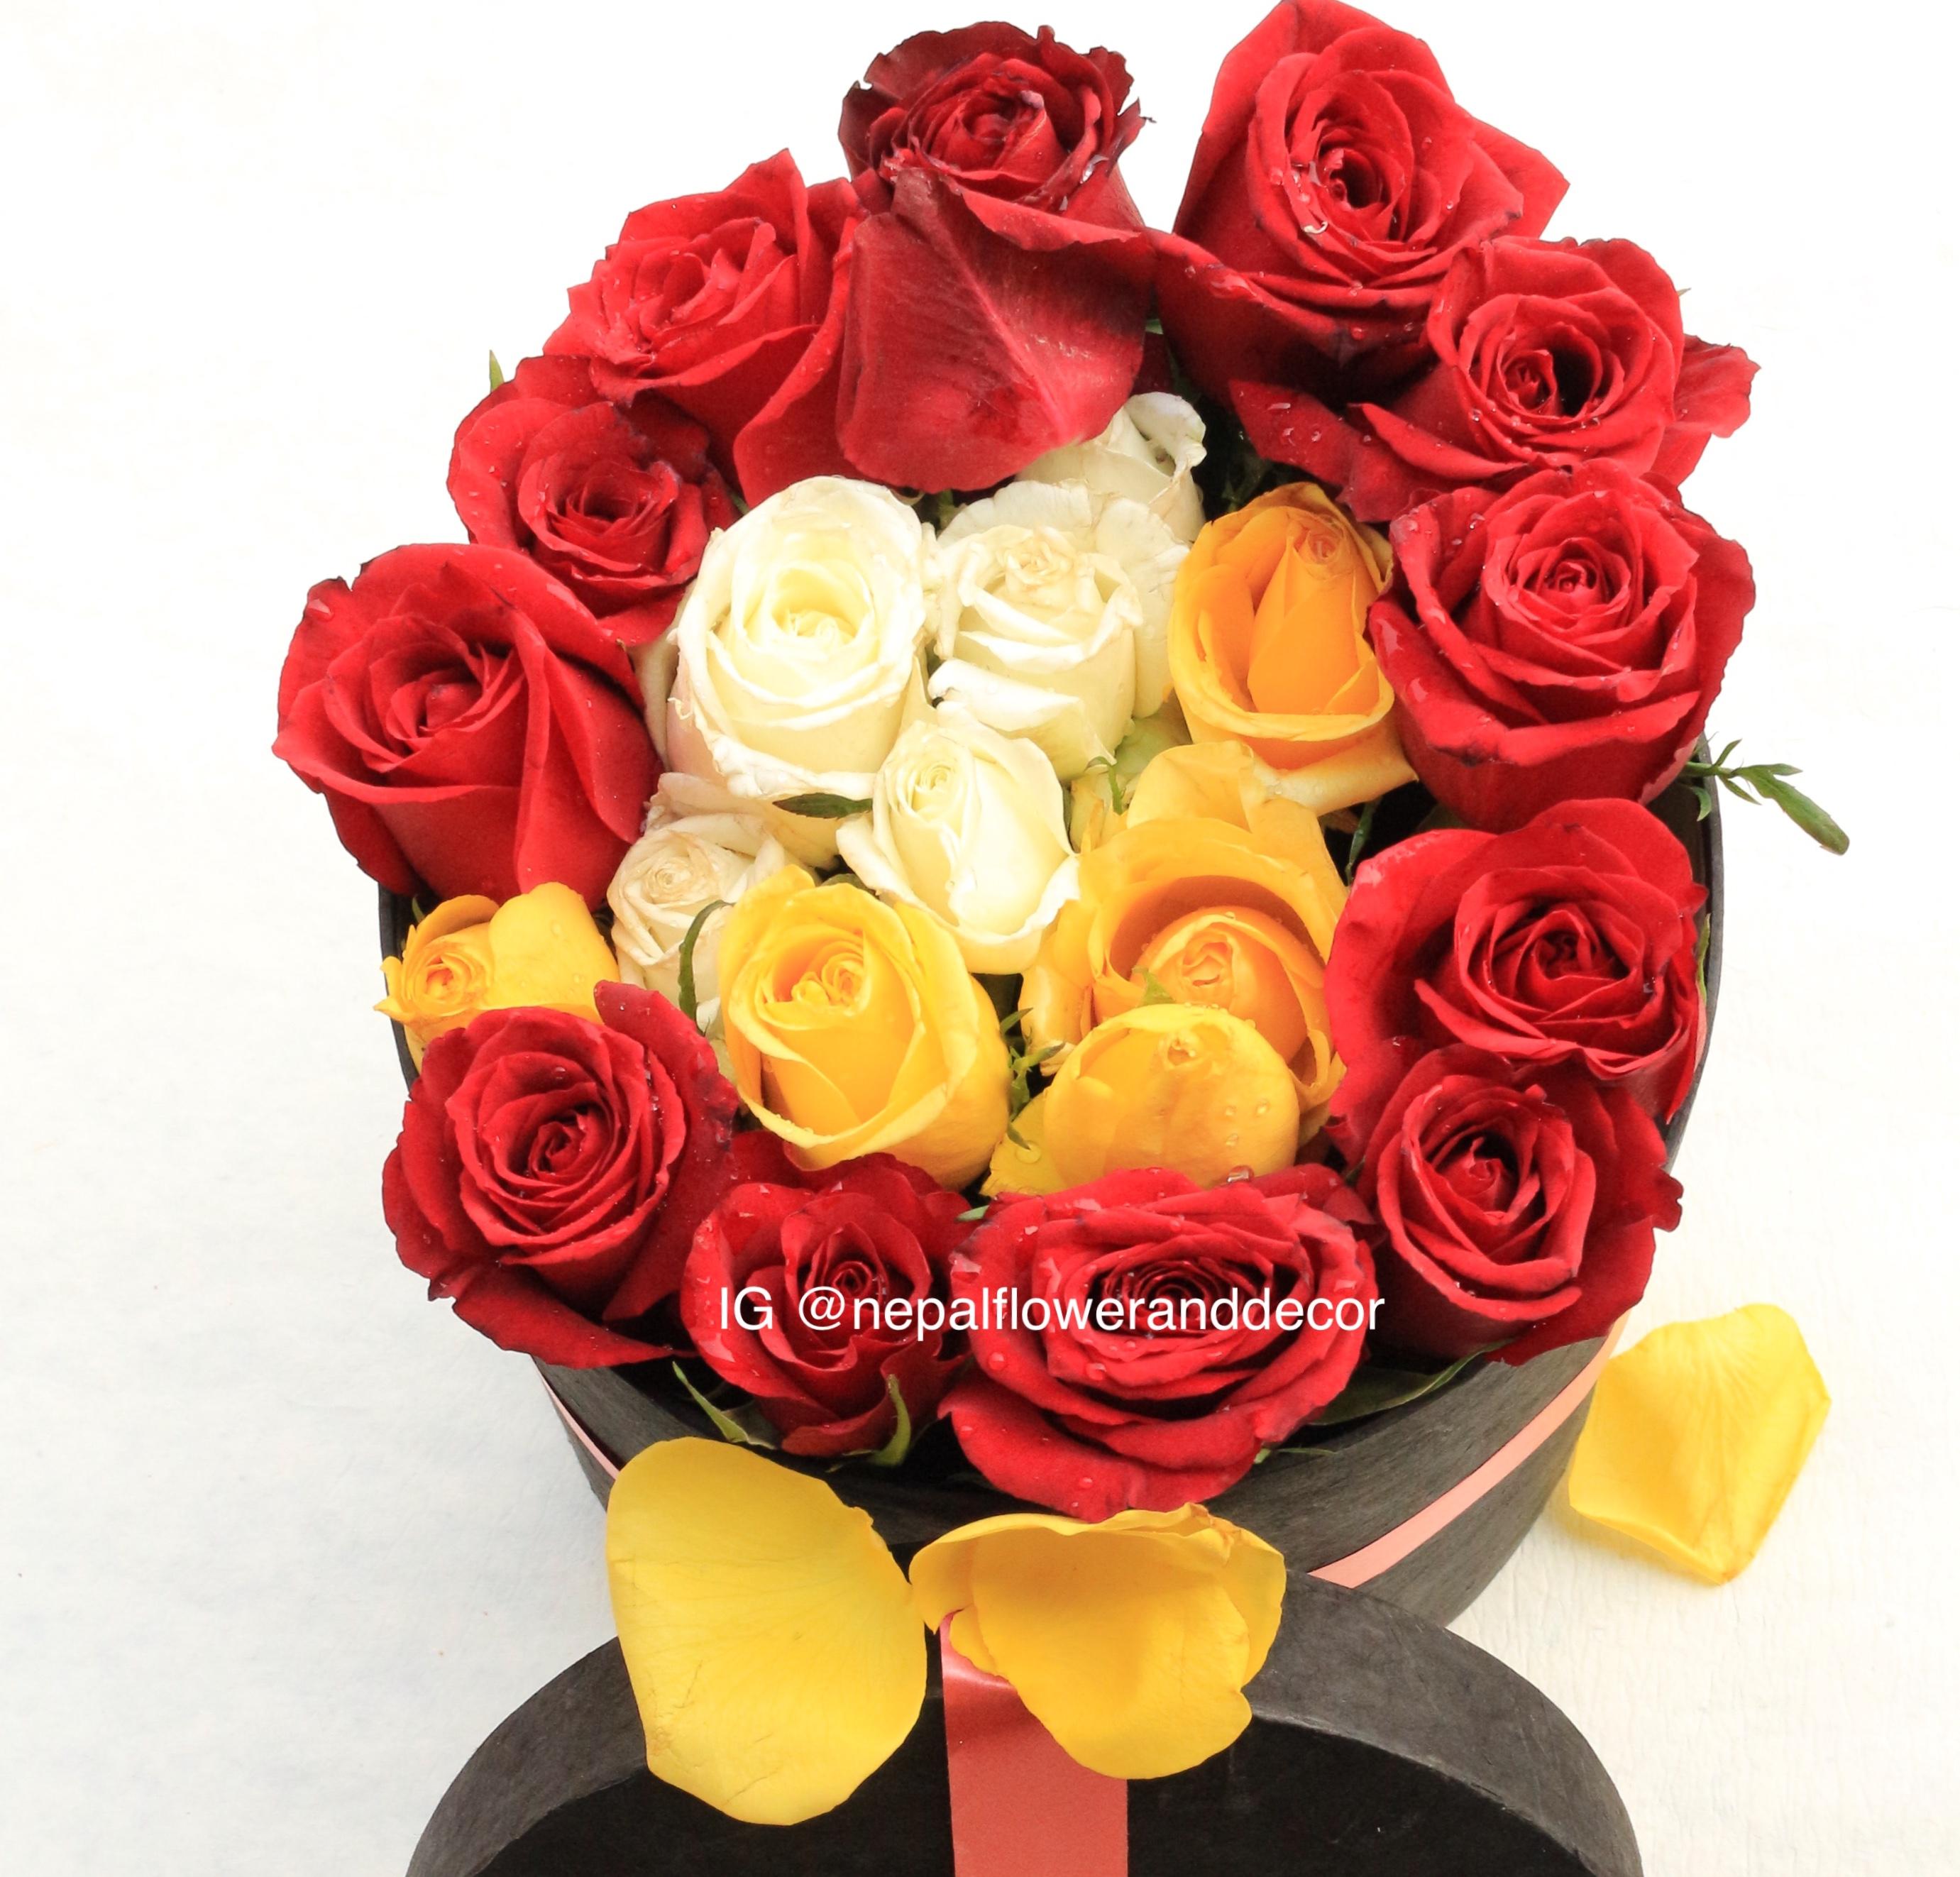 Exelent Colored Flower Photo - Coloring Page - senderolasbrumas.info